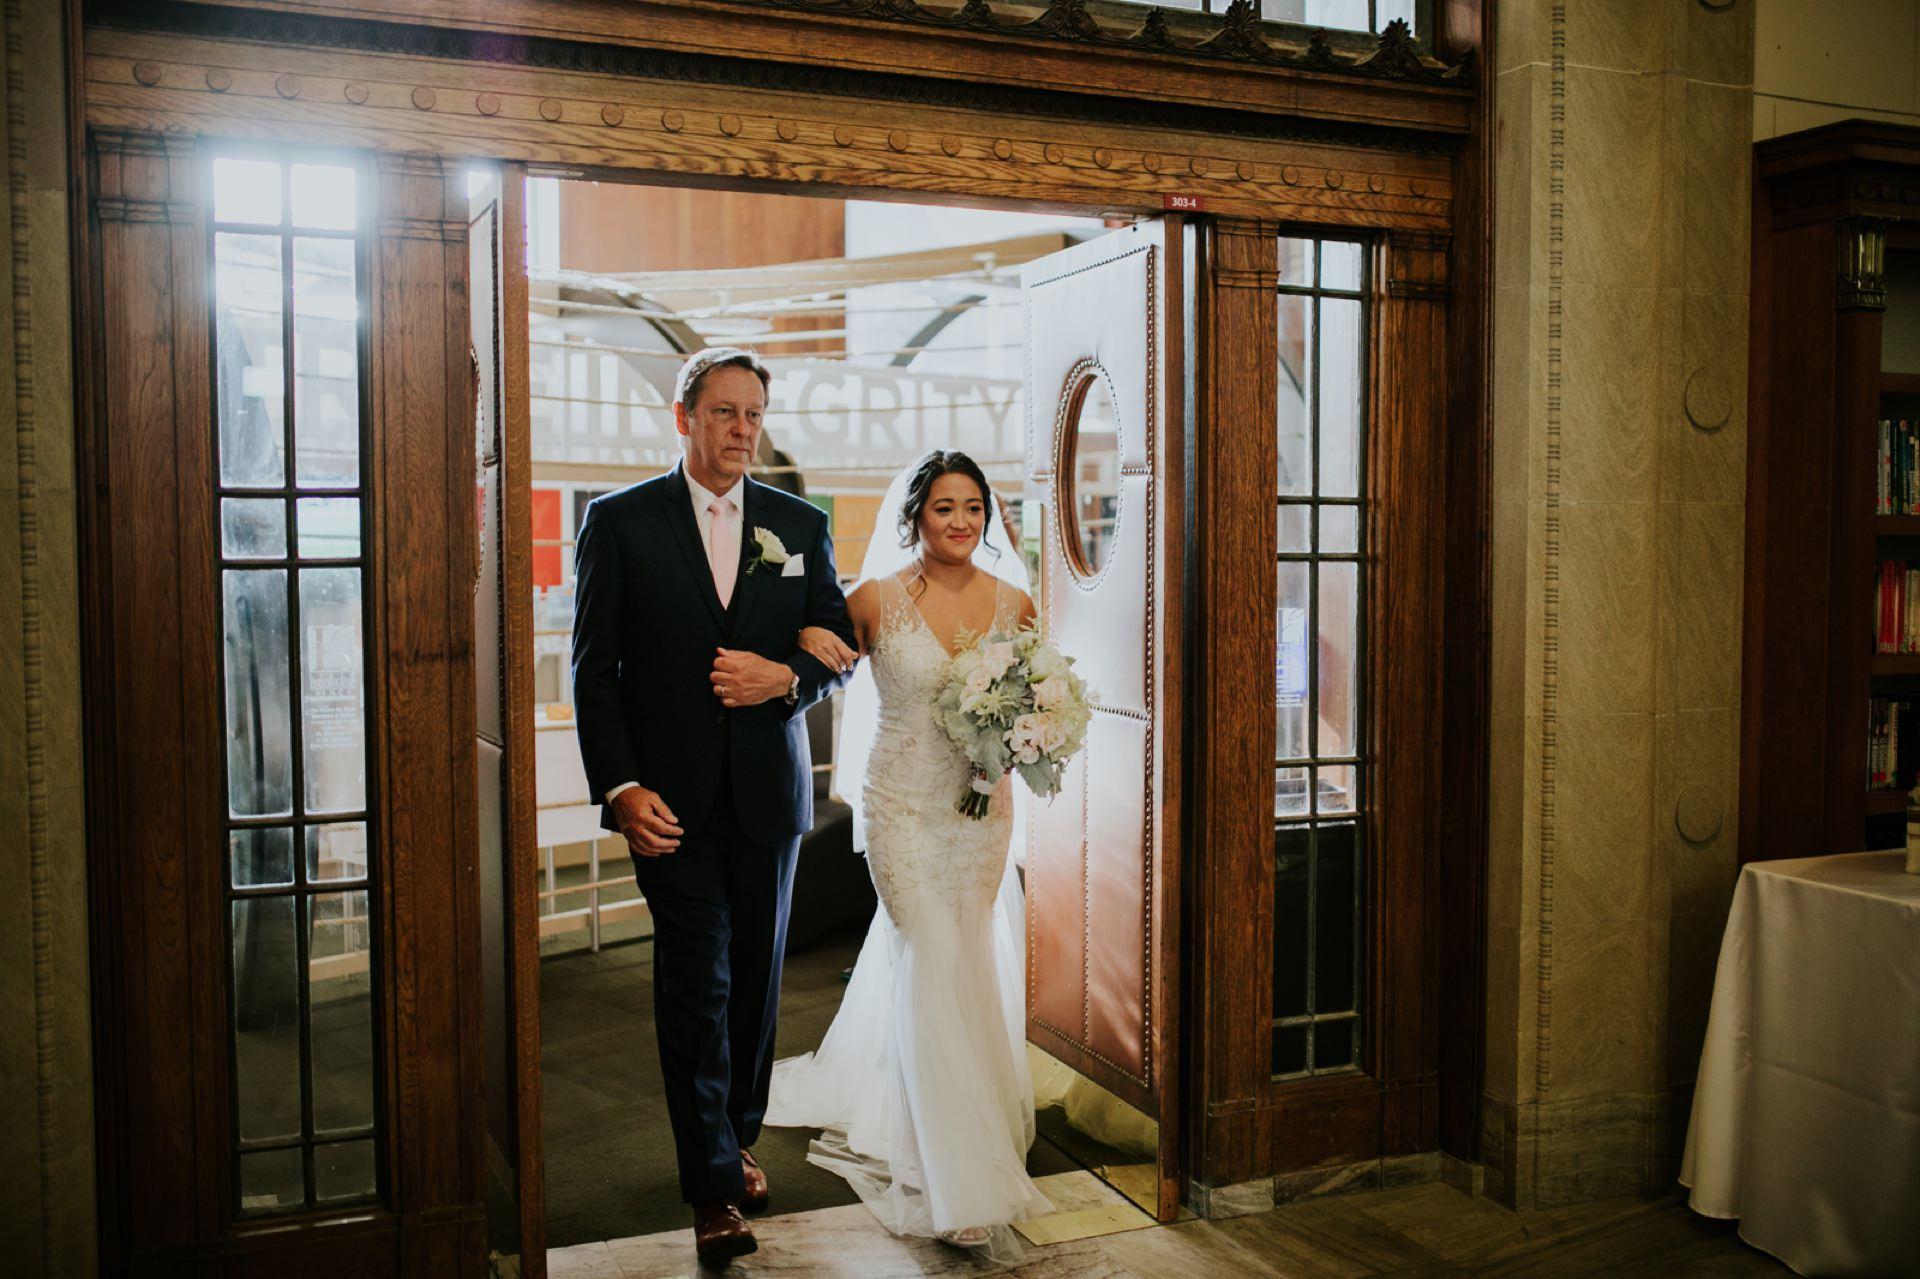 Indianapolis-Public-Library-Wedding_043.jpg